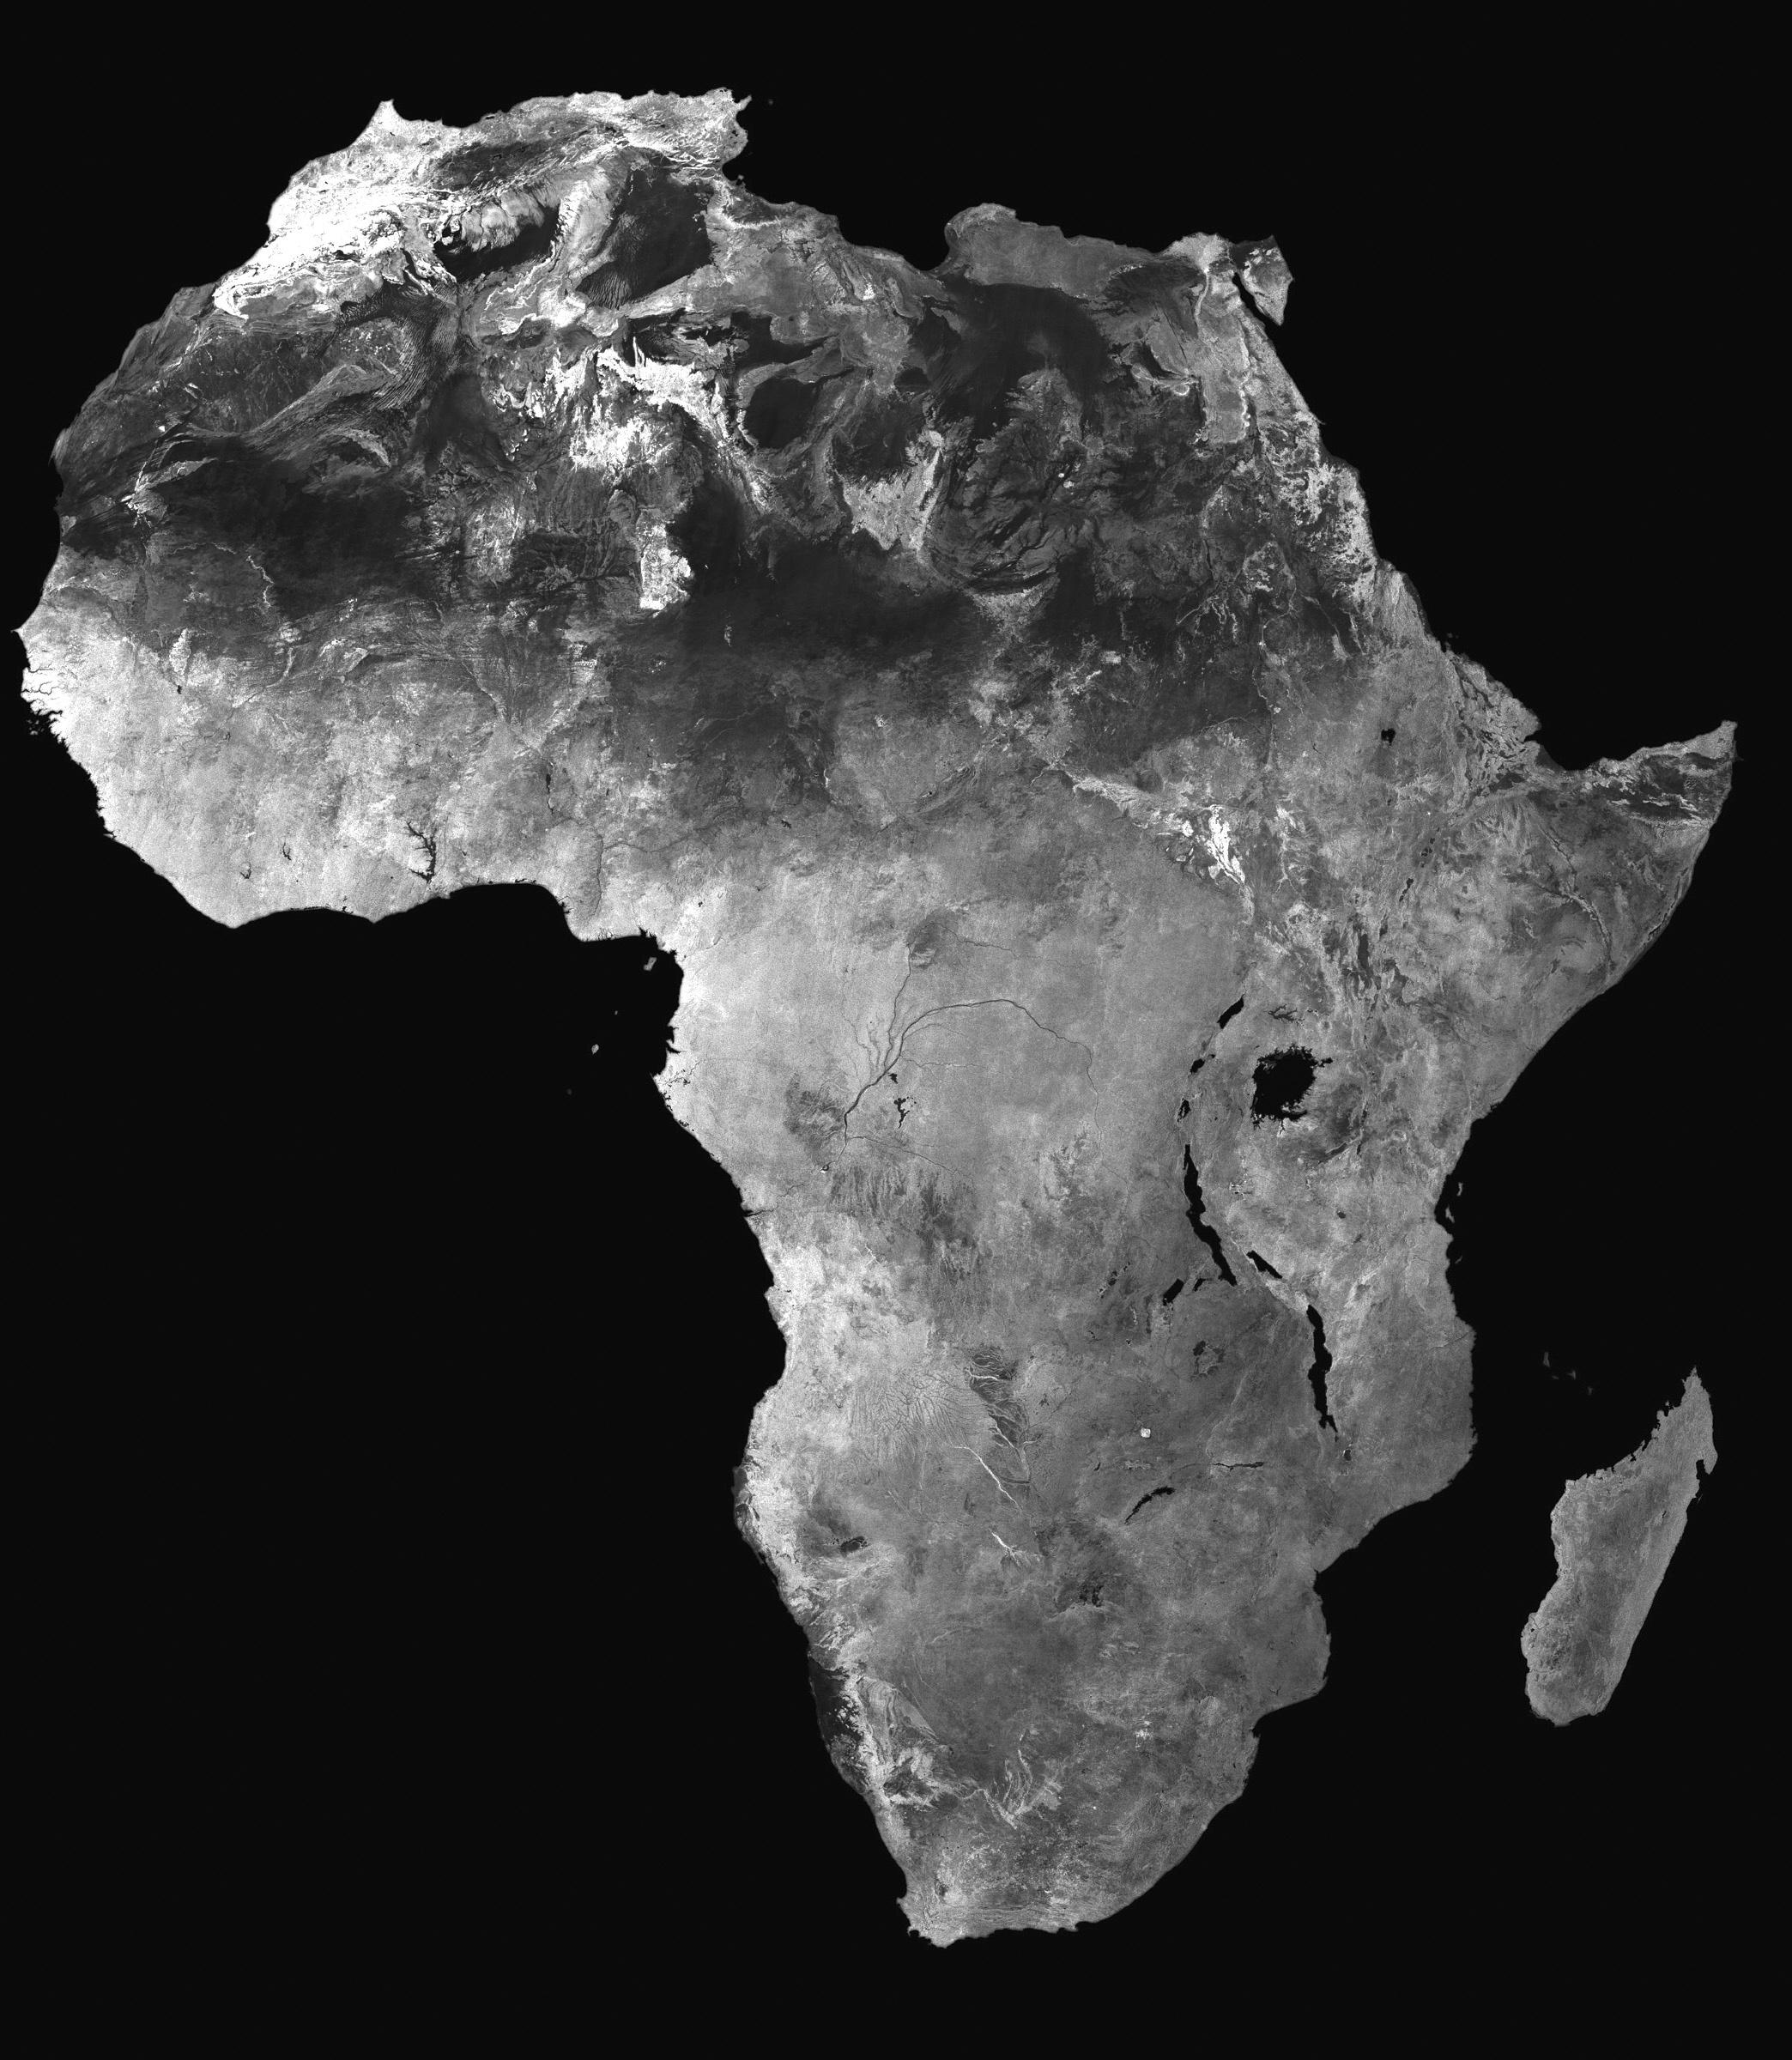 Mosaico satelital de África